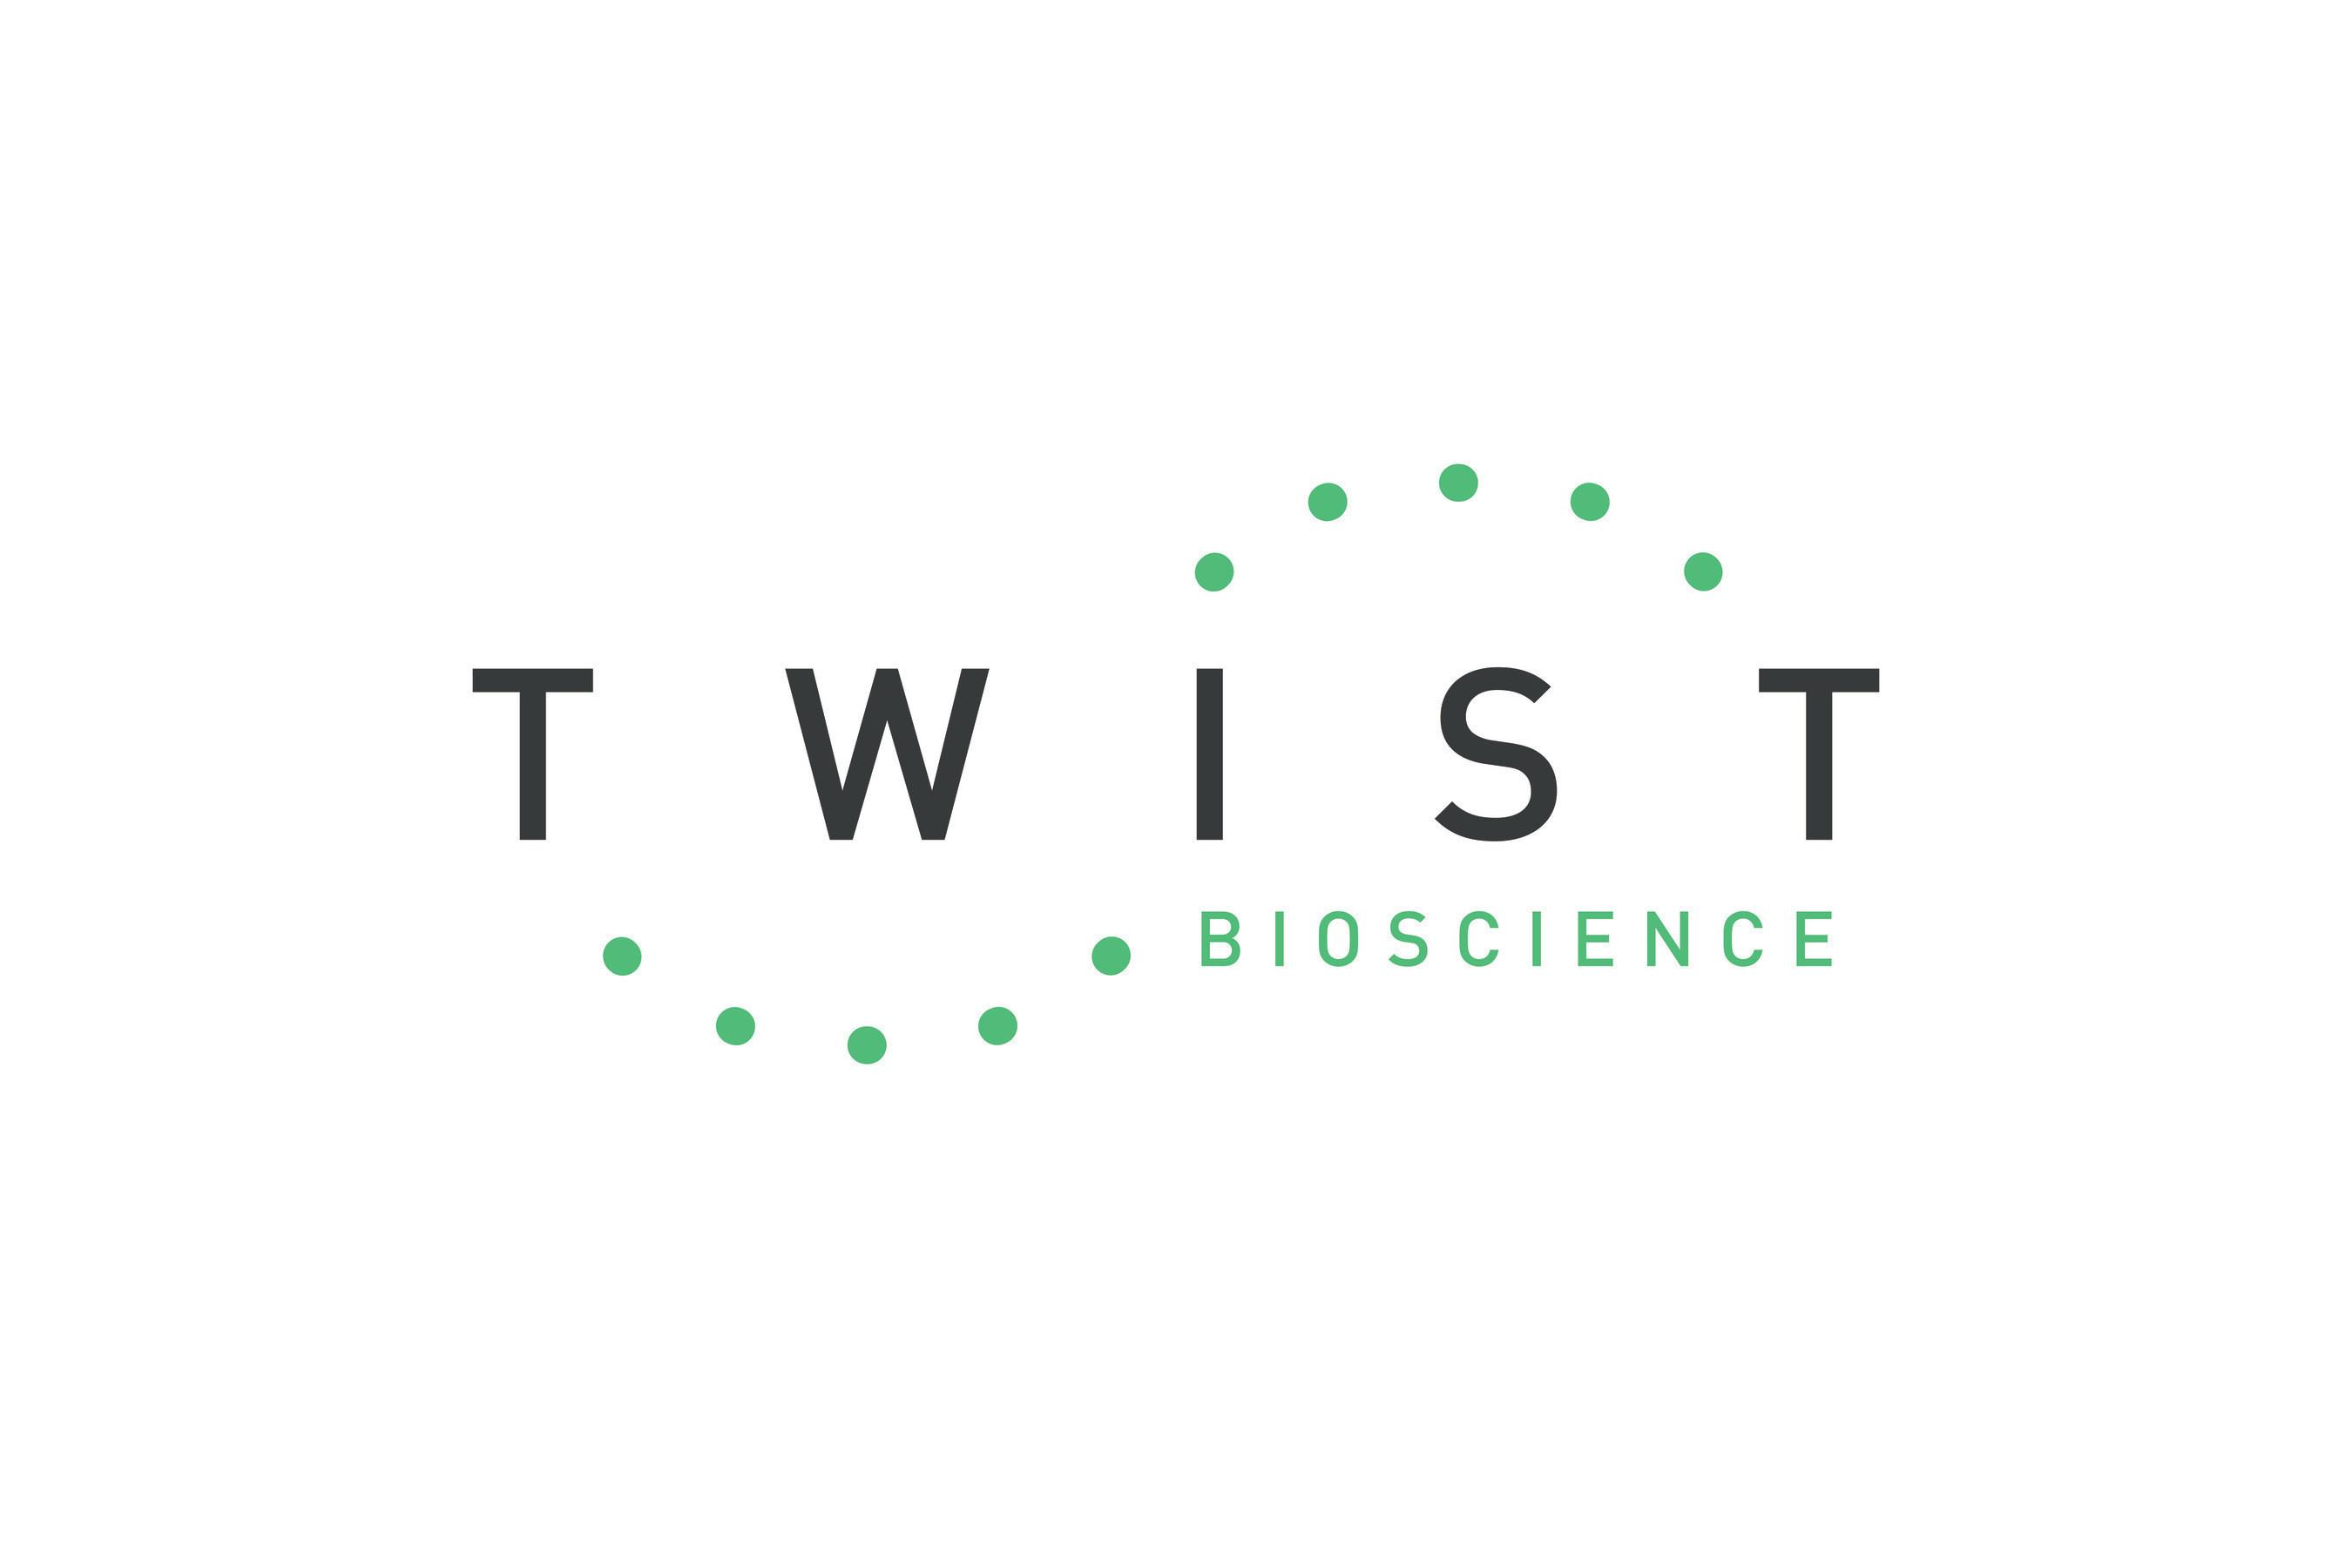 Bioscience editing service